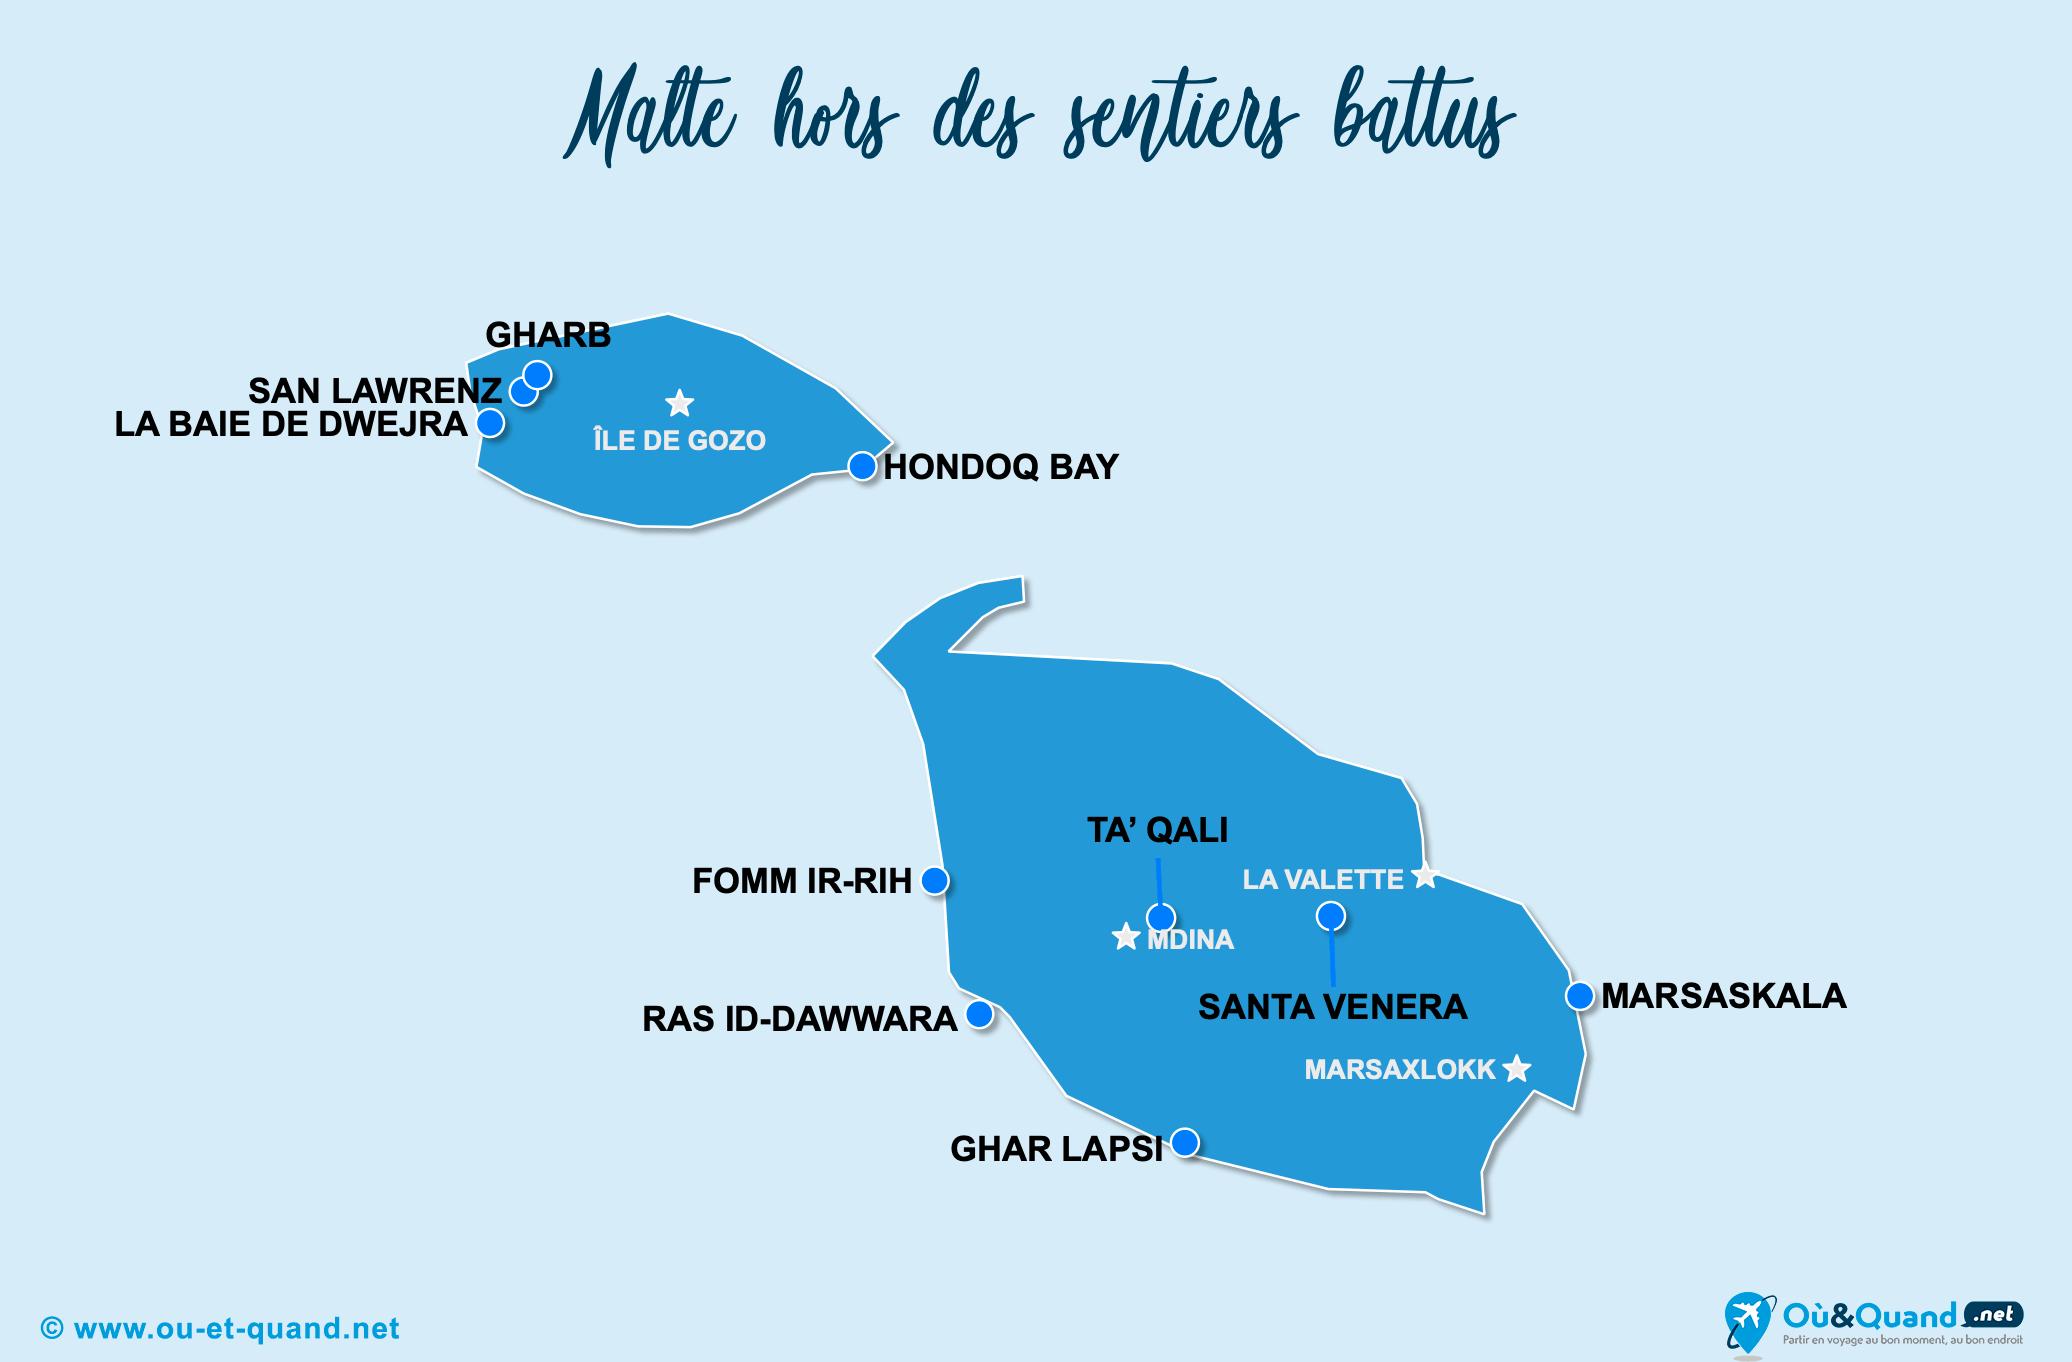 Carte Malte : Malte hors des sentiers battus